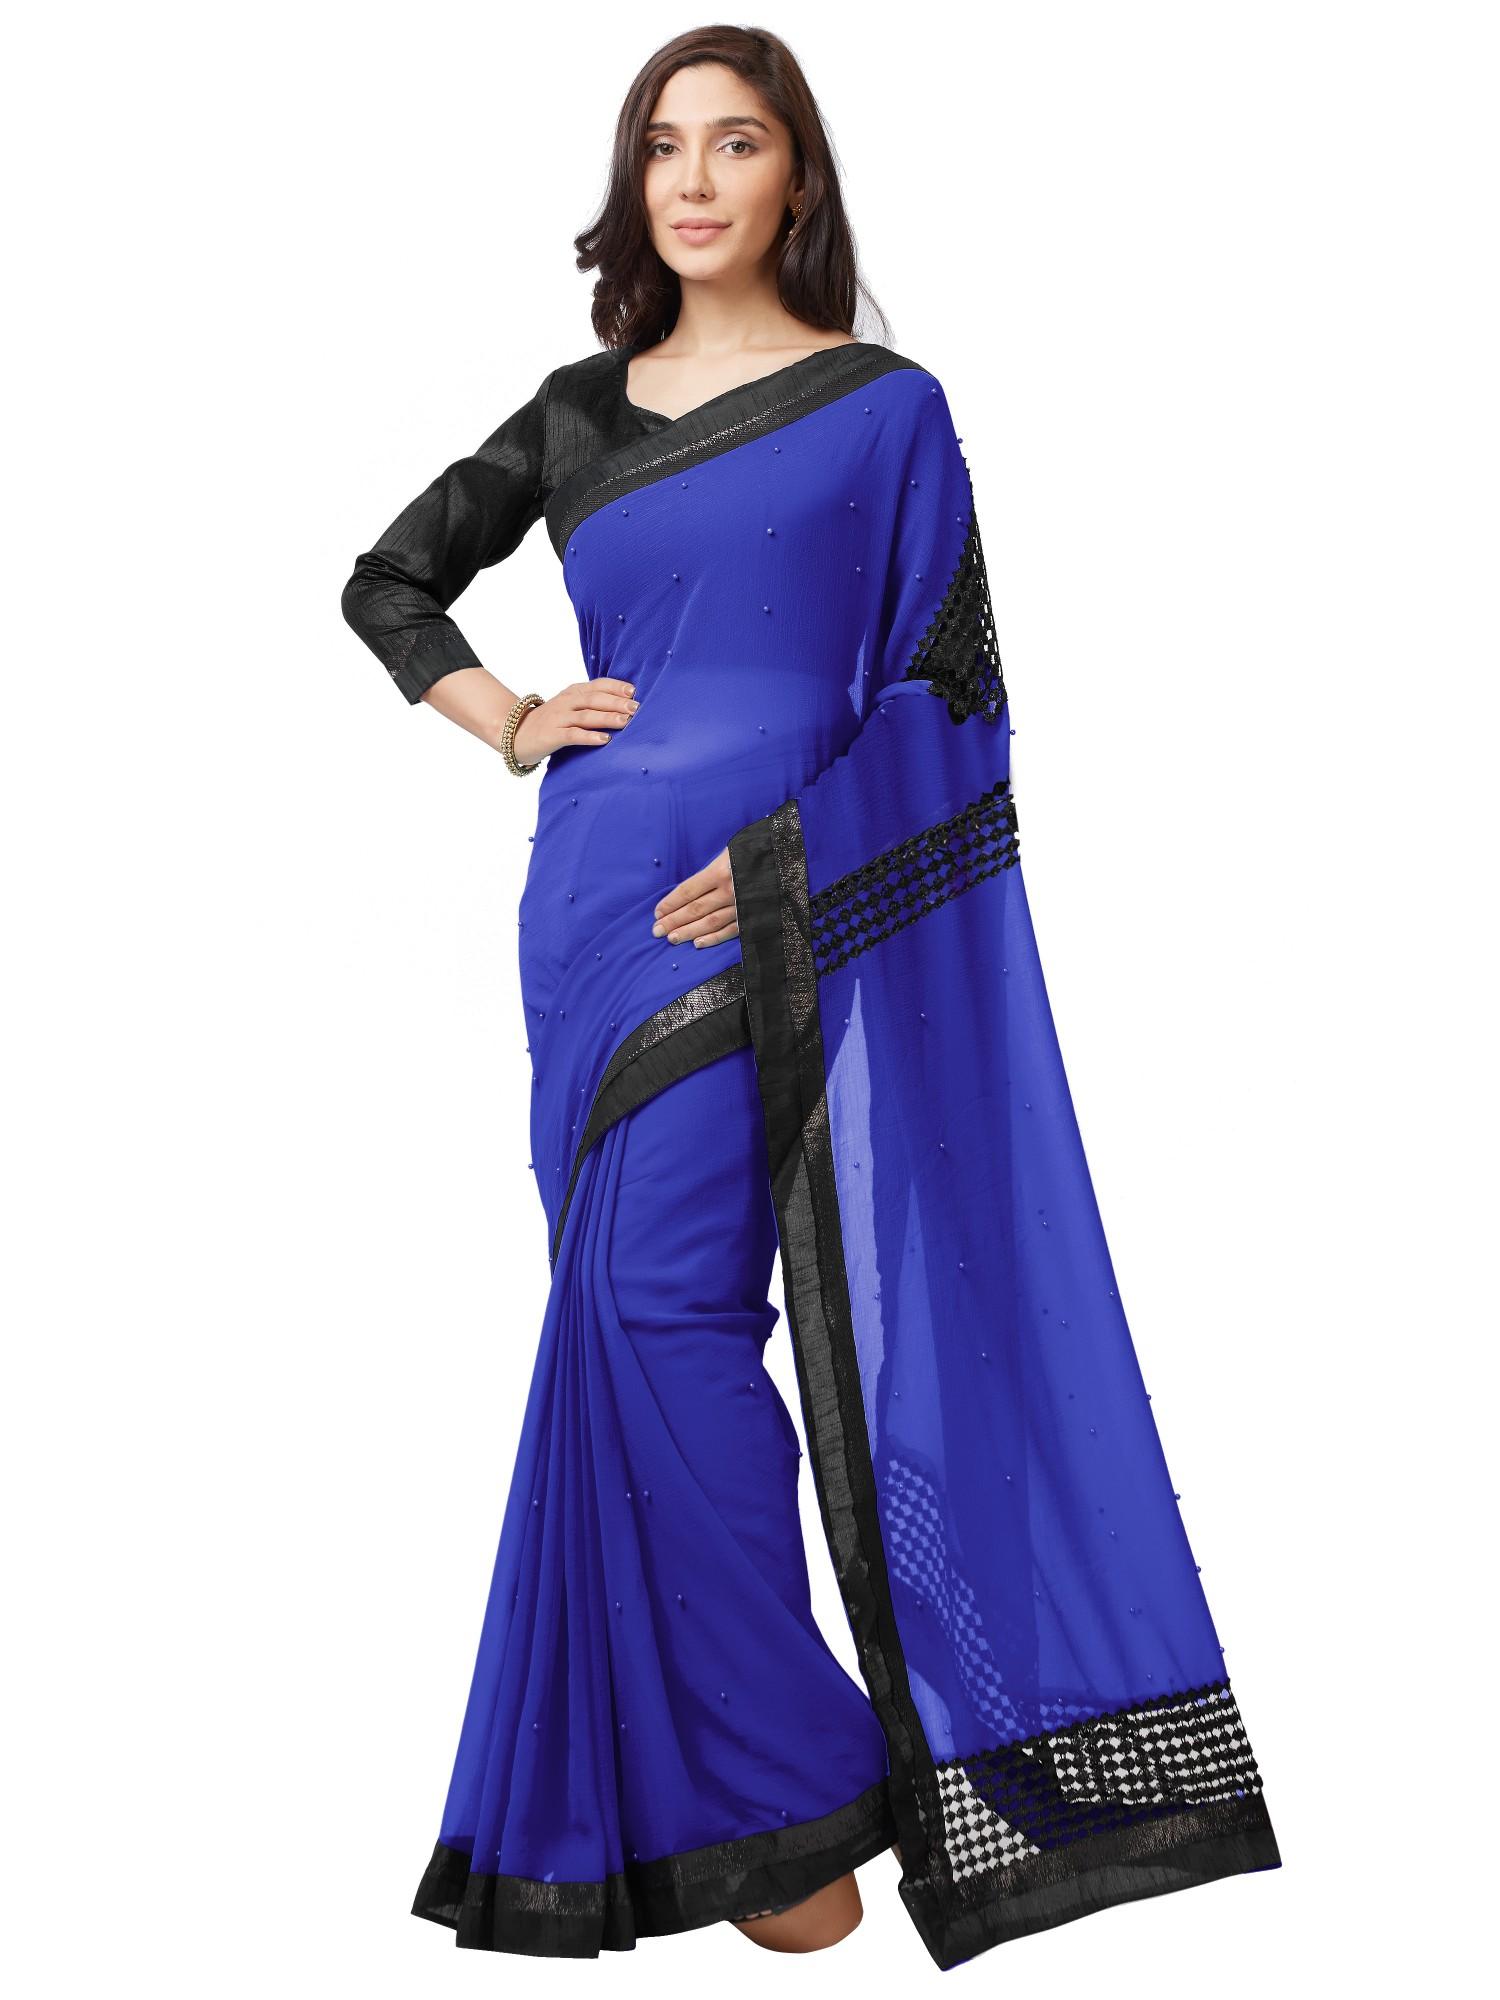 cdfe07a0b233 Royal blue embroidered chiffon saree with blouse - Mirchi Fashion - 2778147